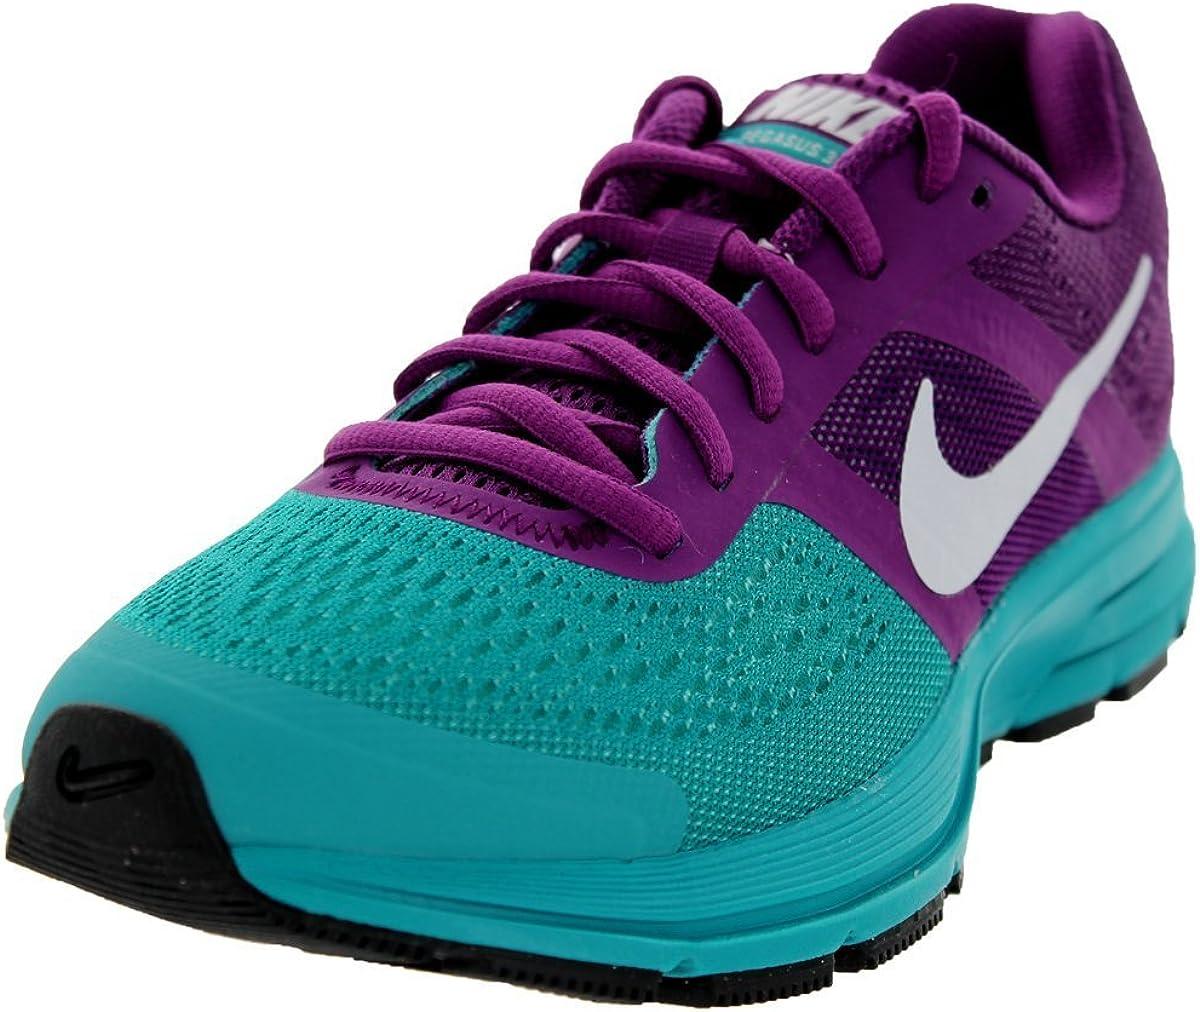 Especialidad sonrojo Alicia  Nike Air Pegasus + 30 Women's Running Shoes W Size: 5.5 UK Purple:  Amazon.co.uk: Shoes & Bags